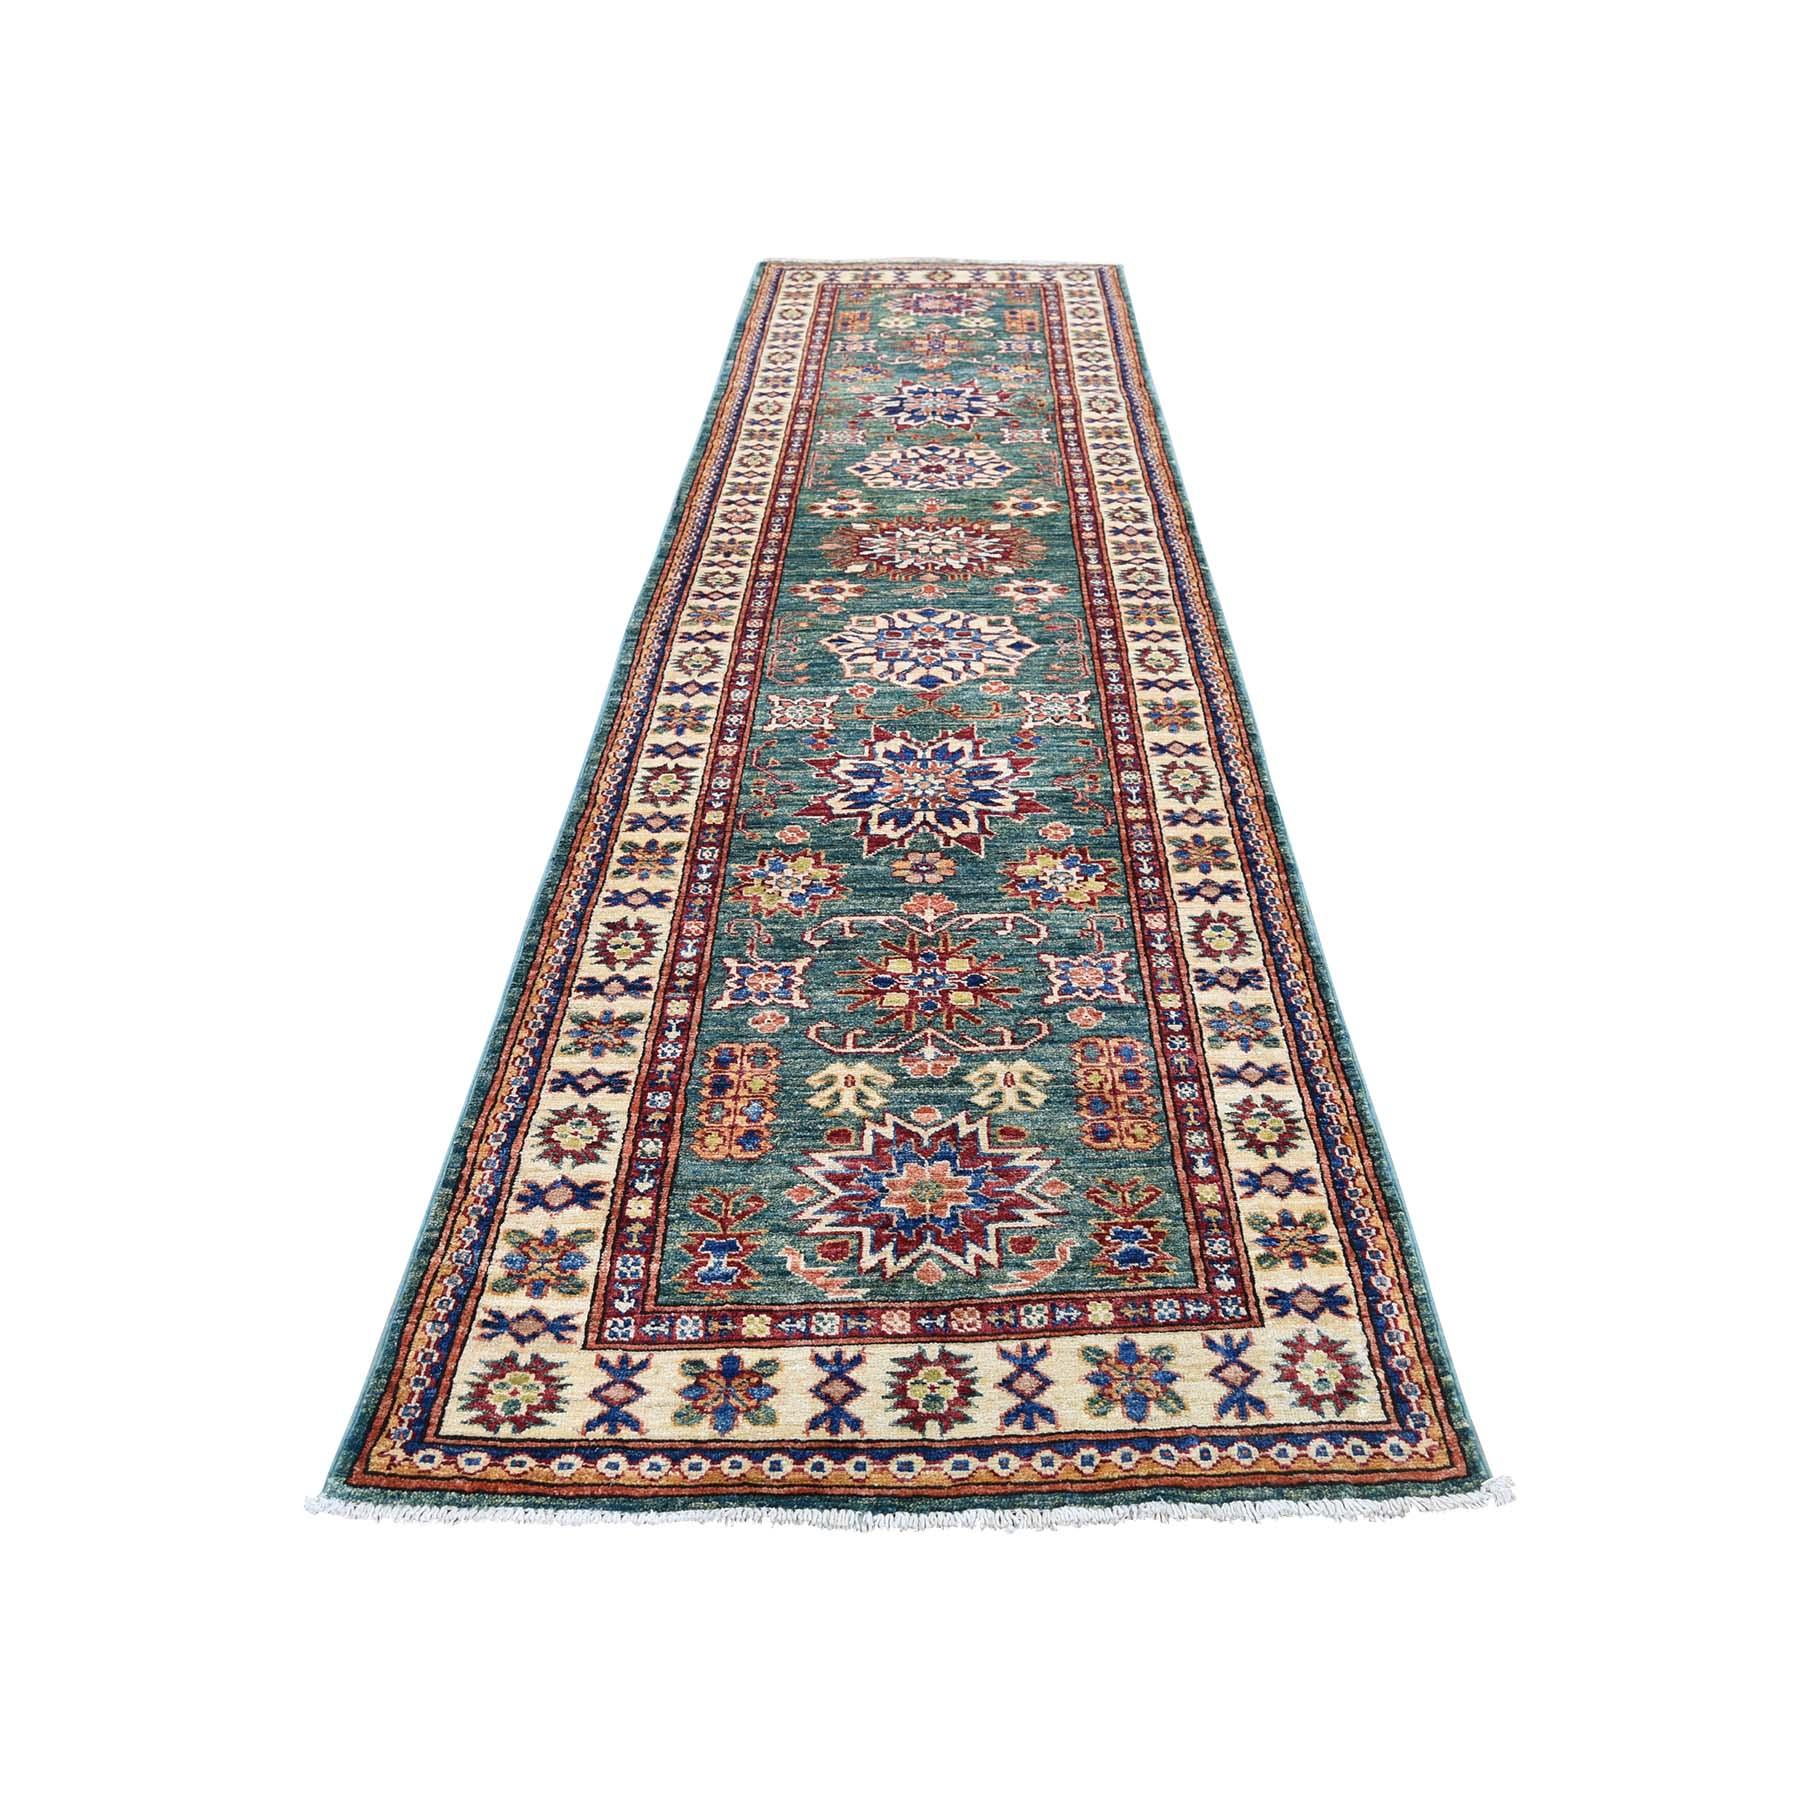 "2'9""X10' Pure Wool Geometric Design Super Kazak Runner Hand-Knotted Oriental Rug moadc0dc"